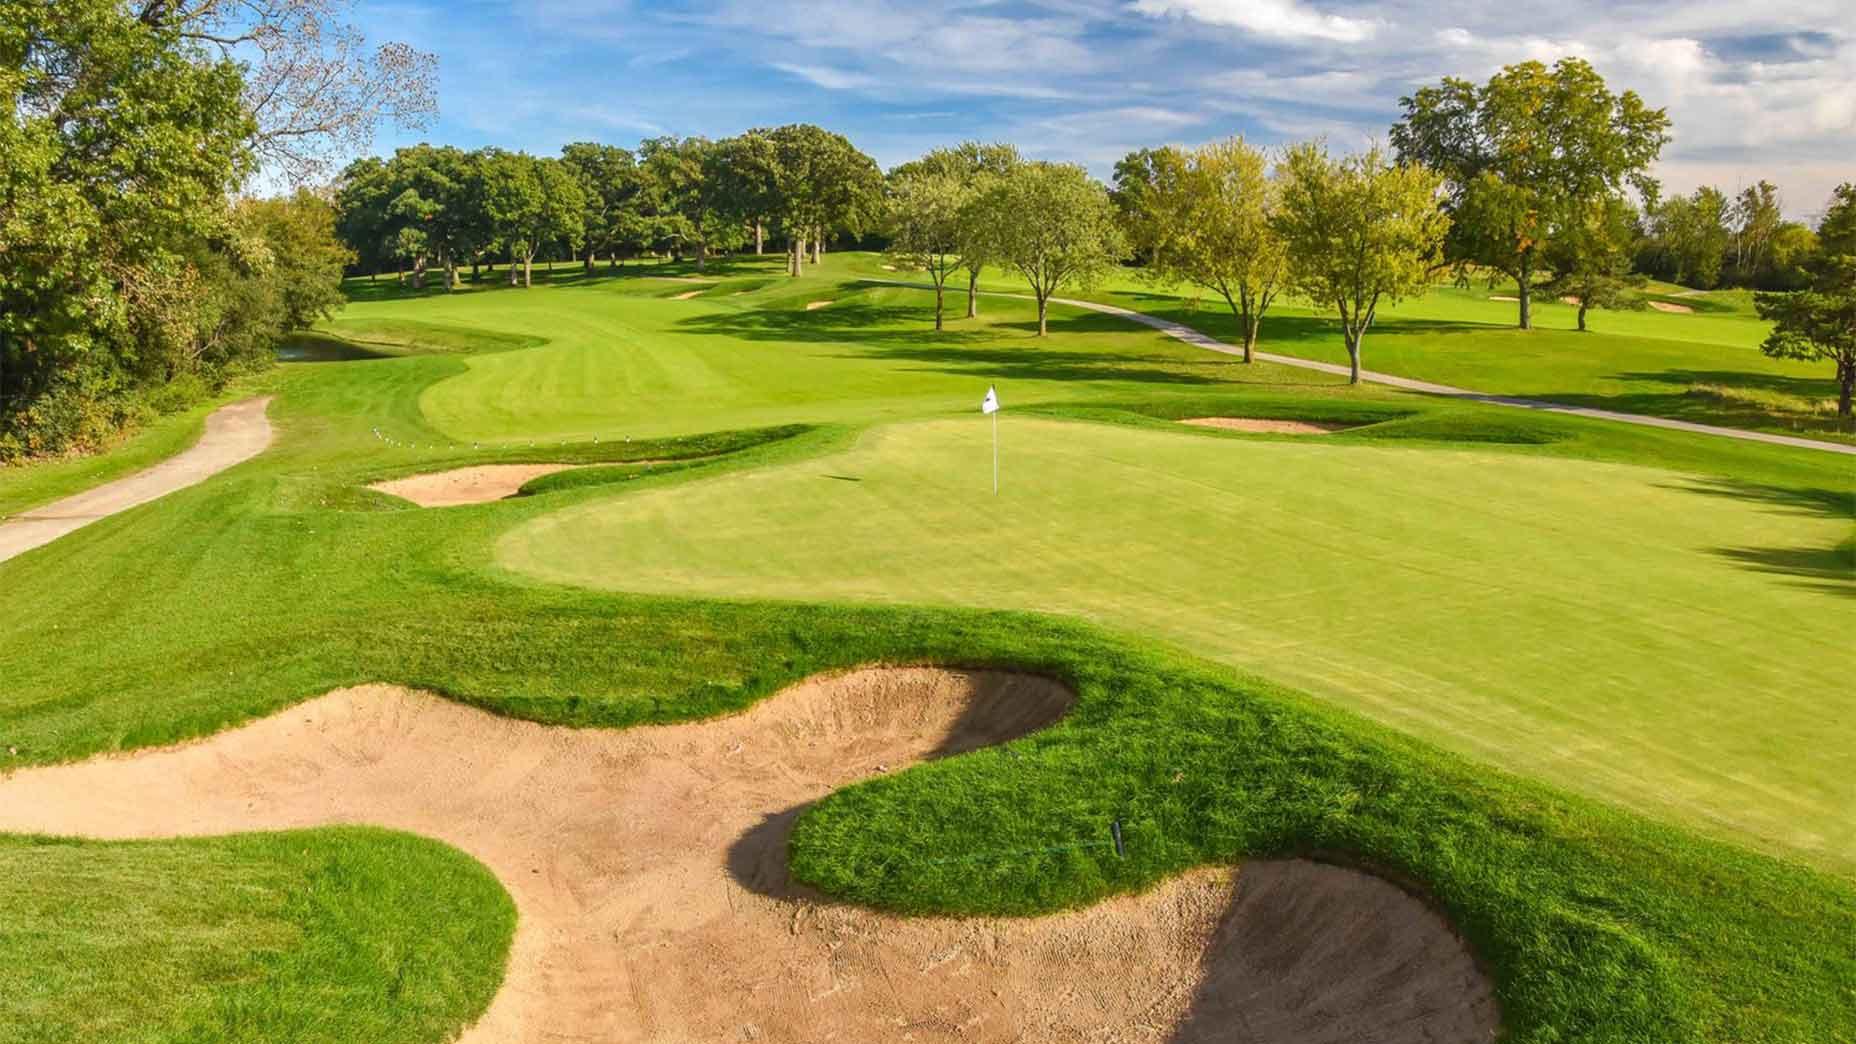 Cog Hill No. 4 golf course